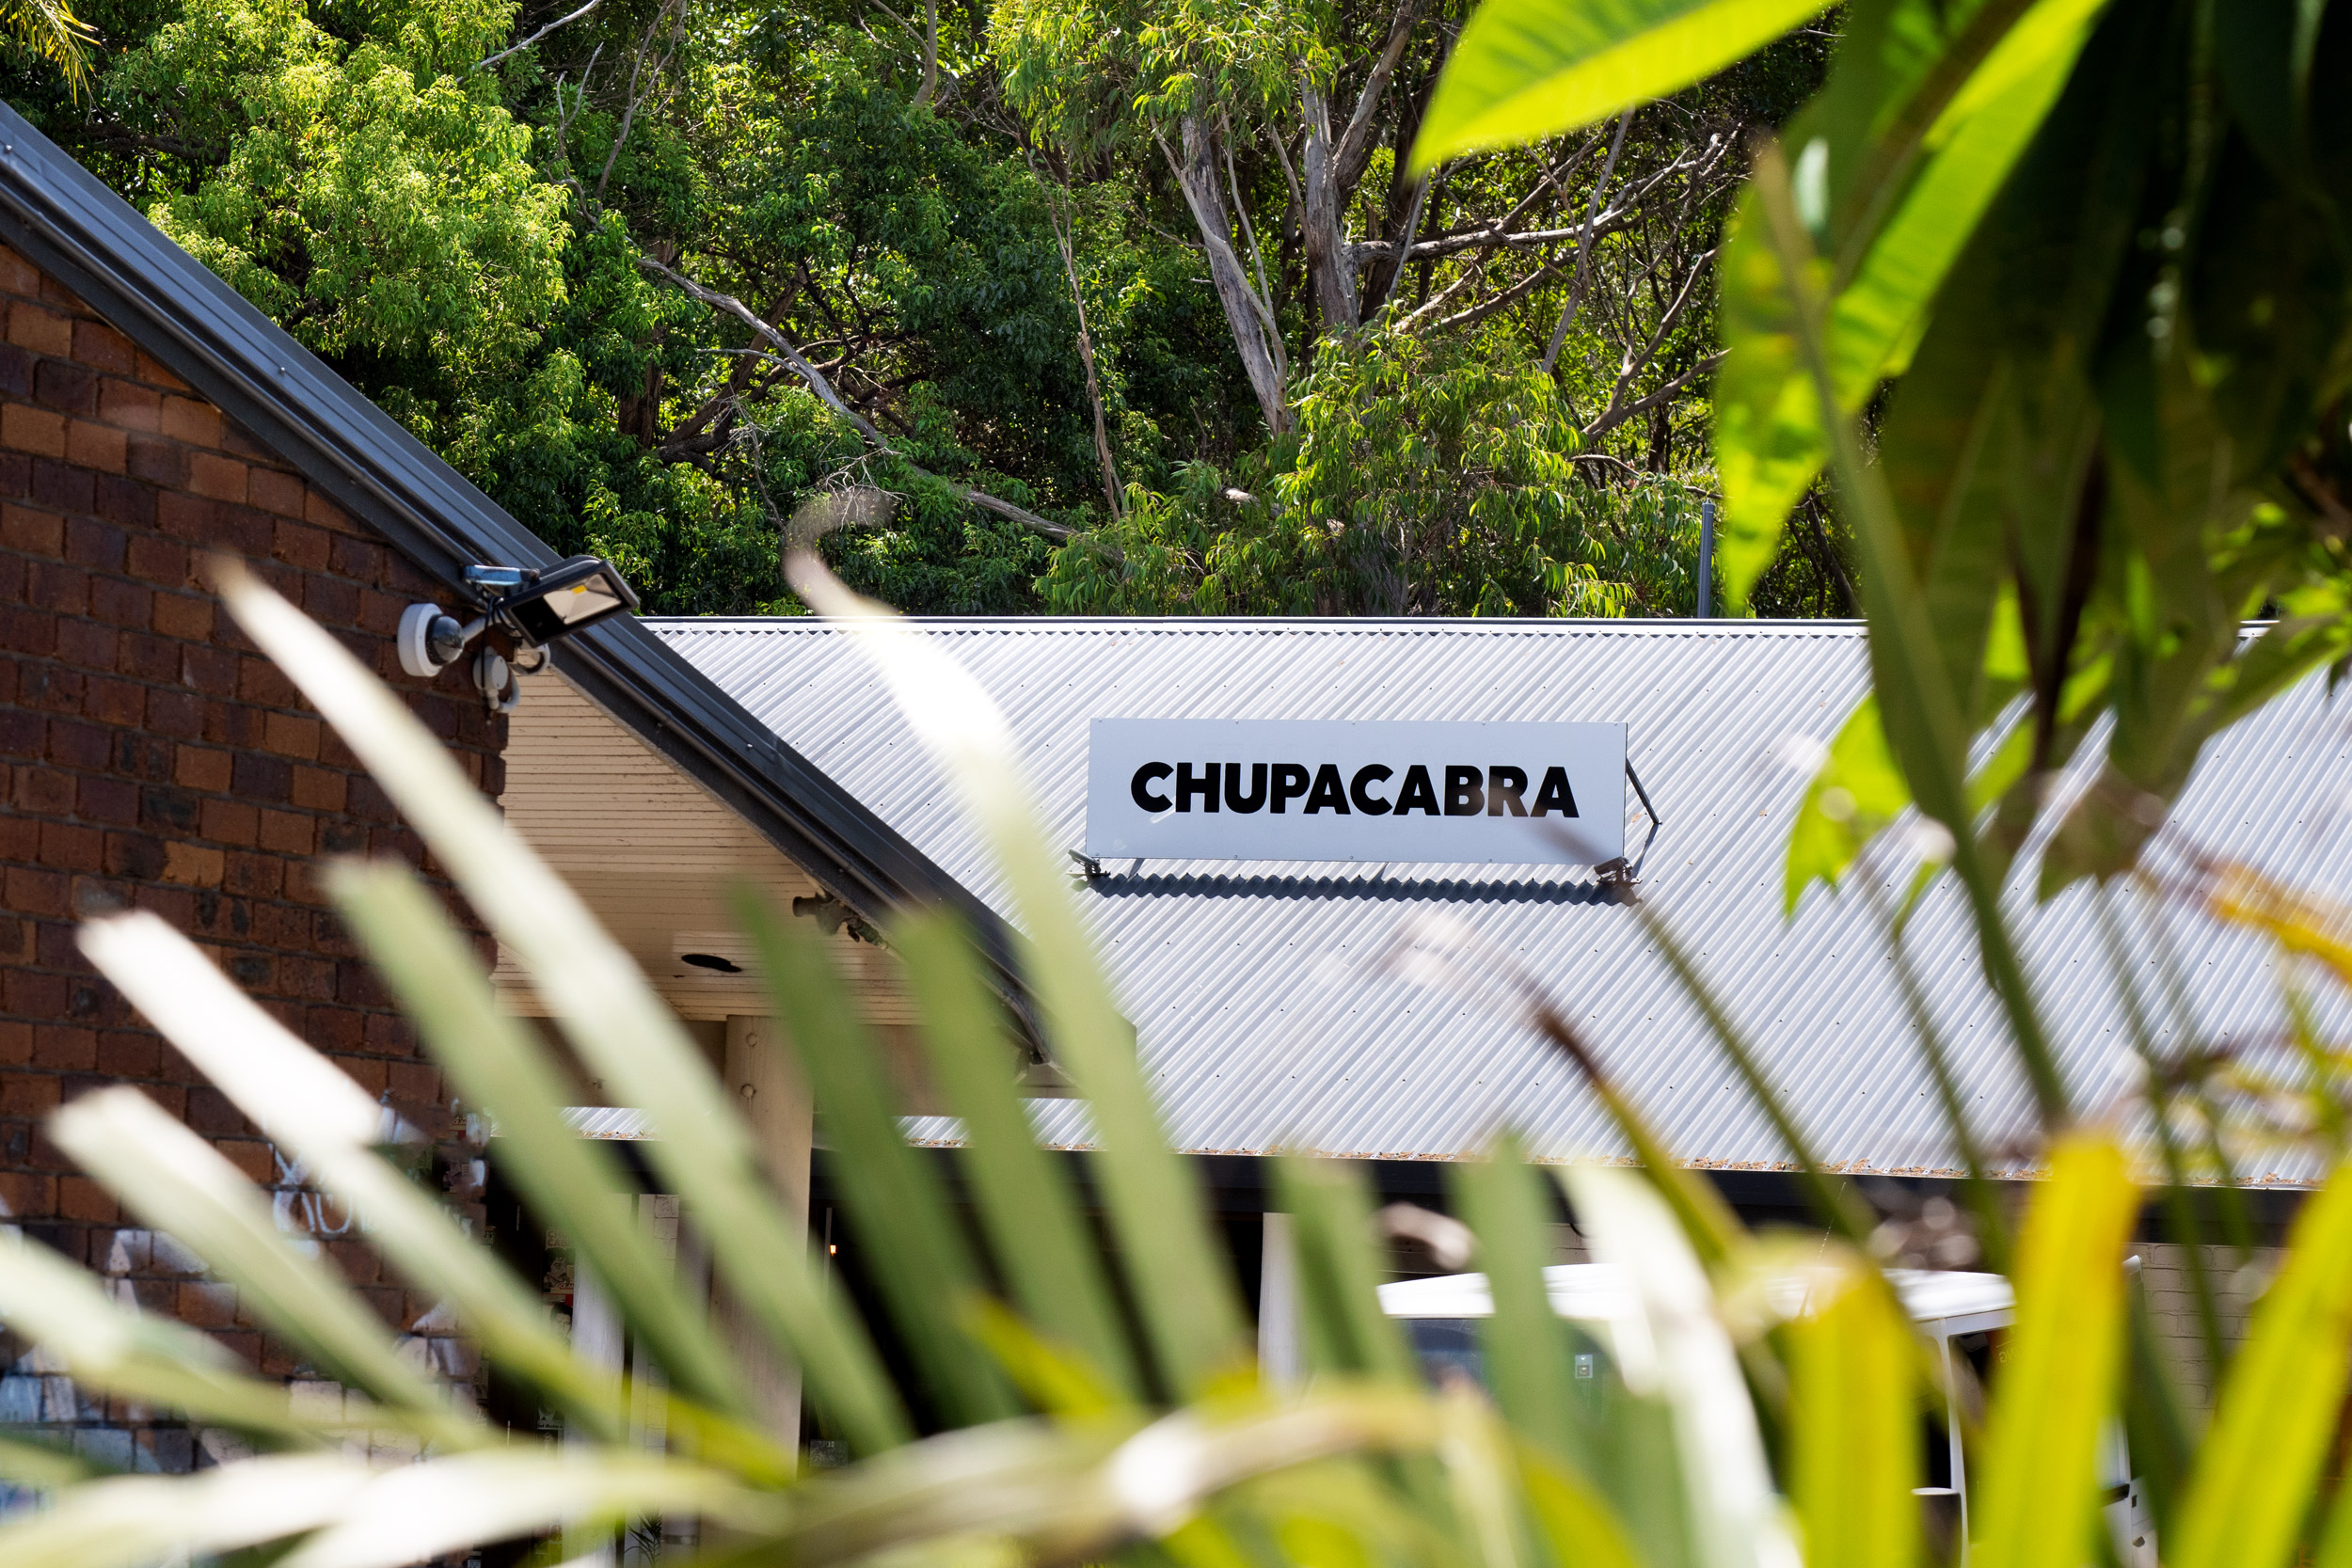 Chupacabra26.jpg